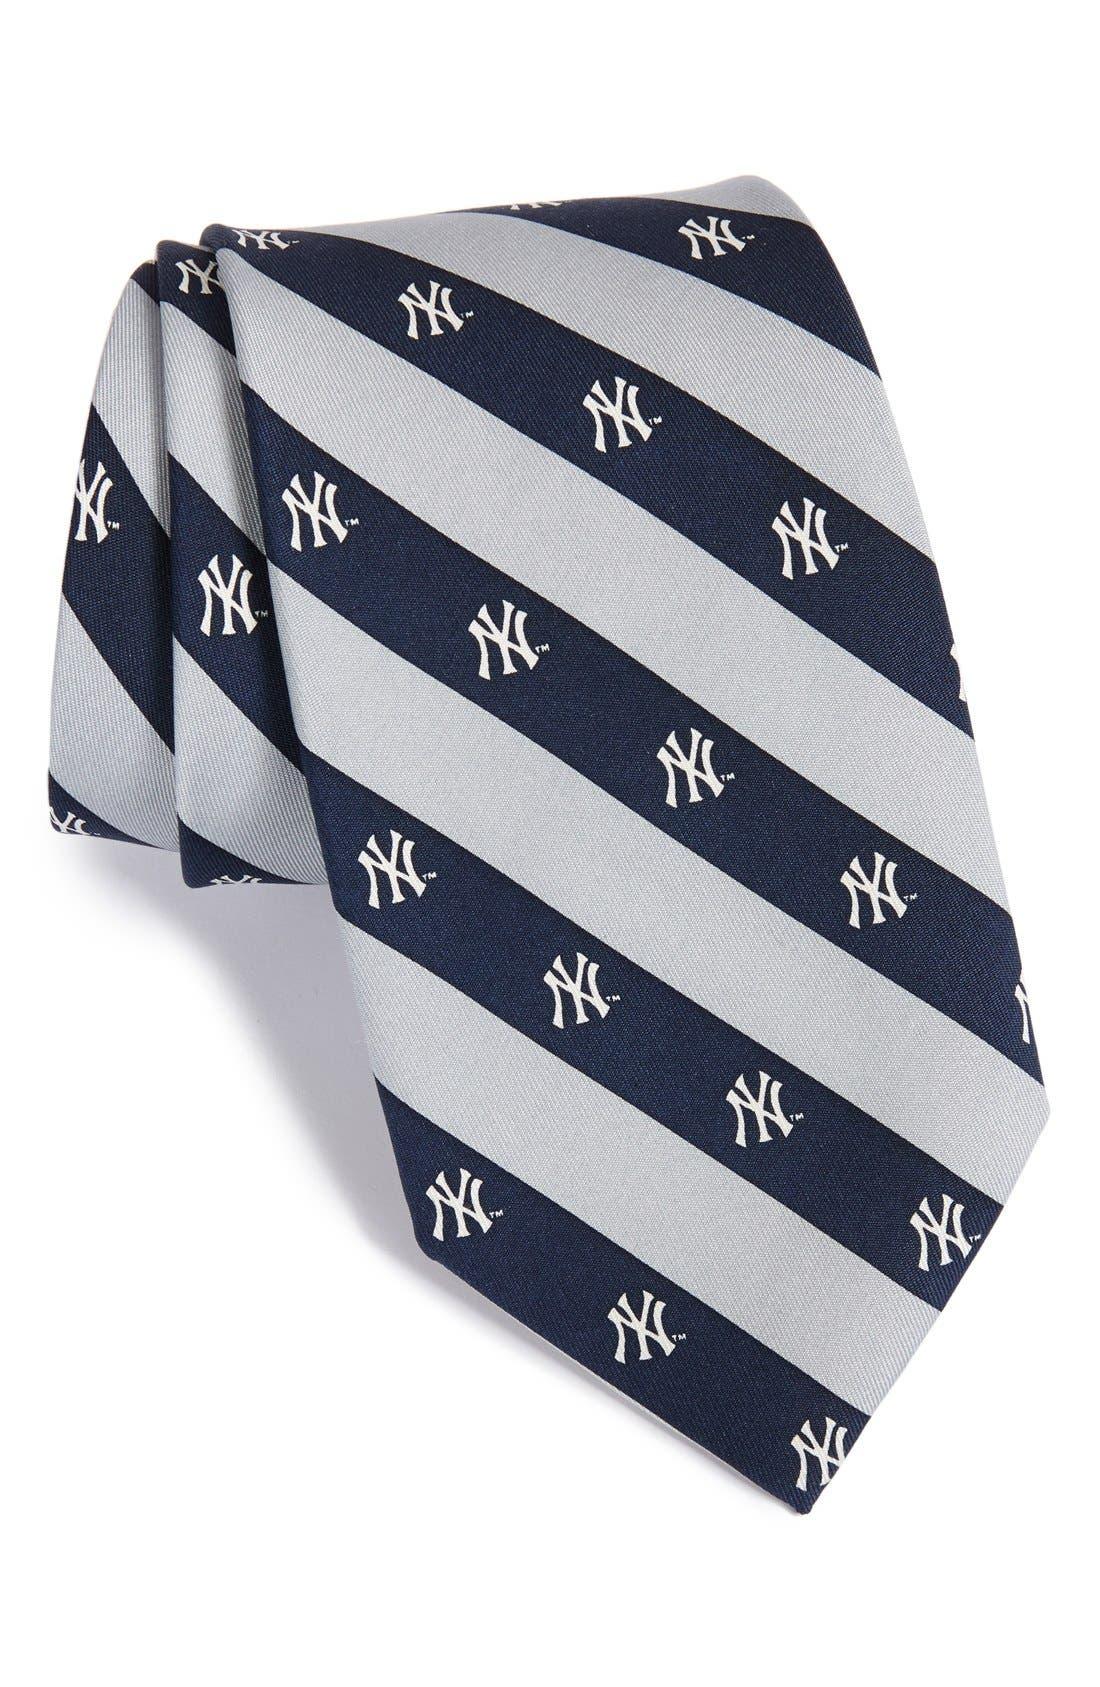 New York Yankees - MLB Print Silk Tie,                         Main,                         color, Navy